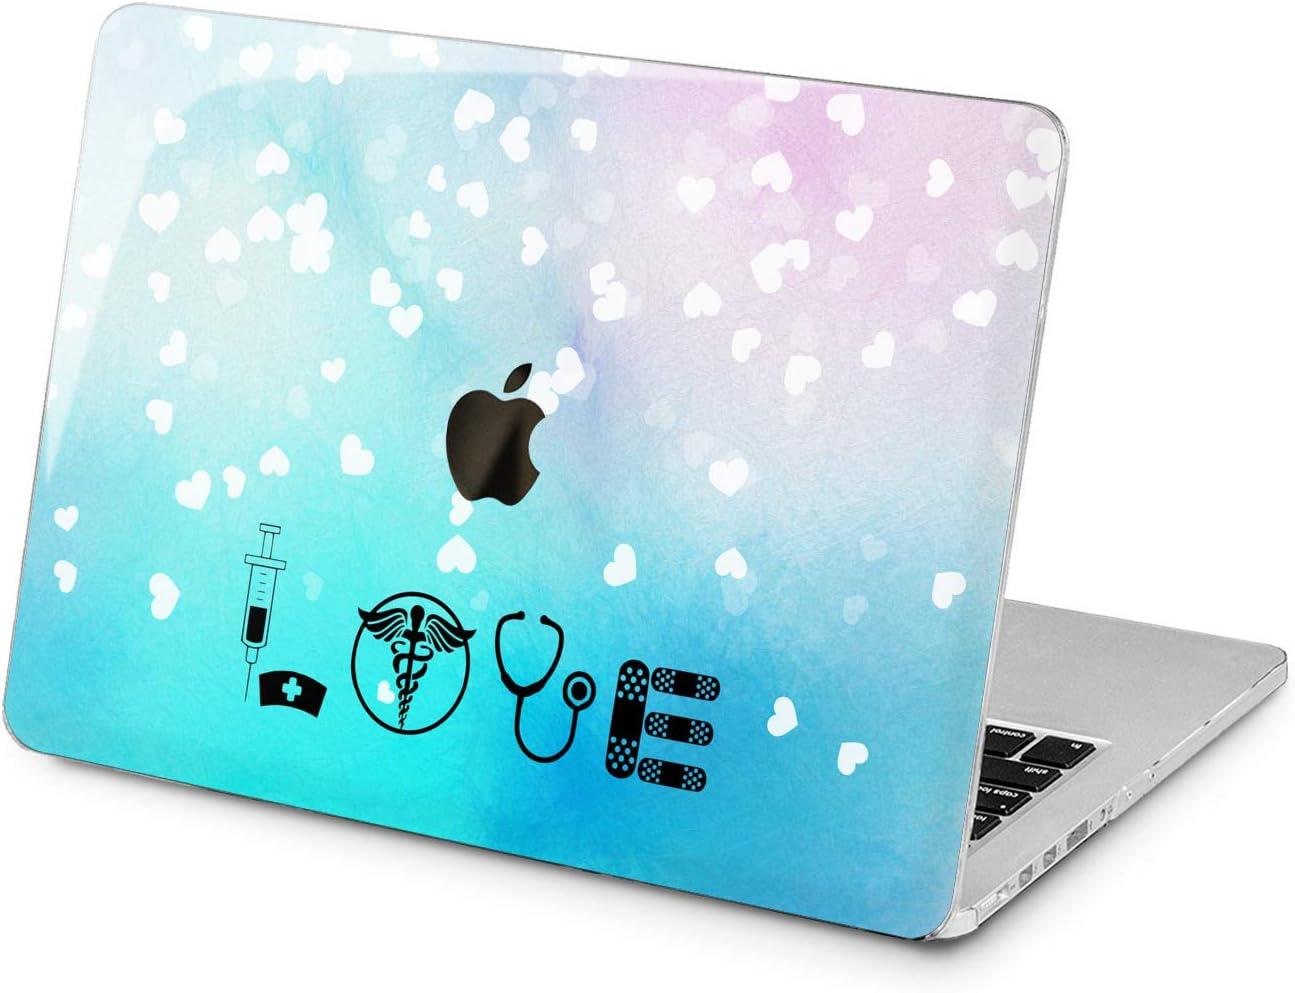 "Cavka Hard Shell Case for Apple MacBook Pro 13"" 2019 15"" 2018 Air 13"" 2020 Retina 2015 Mac 11"" Mac 12"" Plastic Especial Cover Blue Medicine Quote Protective Heart Print Design Laptop Pattern Love"